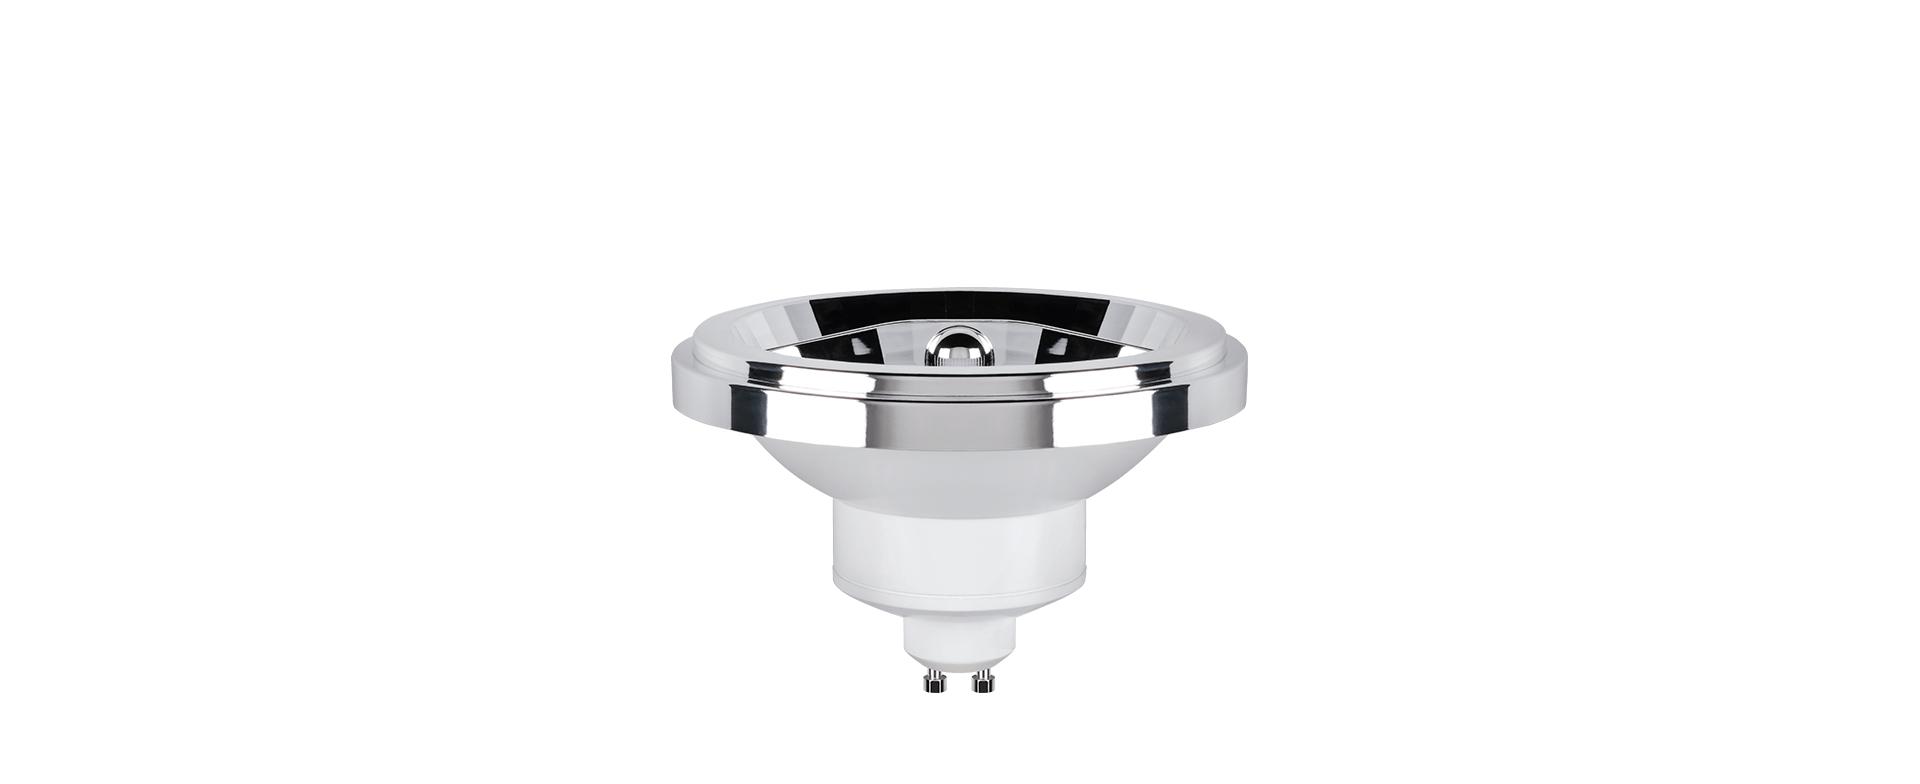 Lâmpada LED AR 111 12W 12° Branco Quente Bivolt Stella -STH8443/27